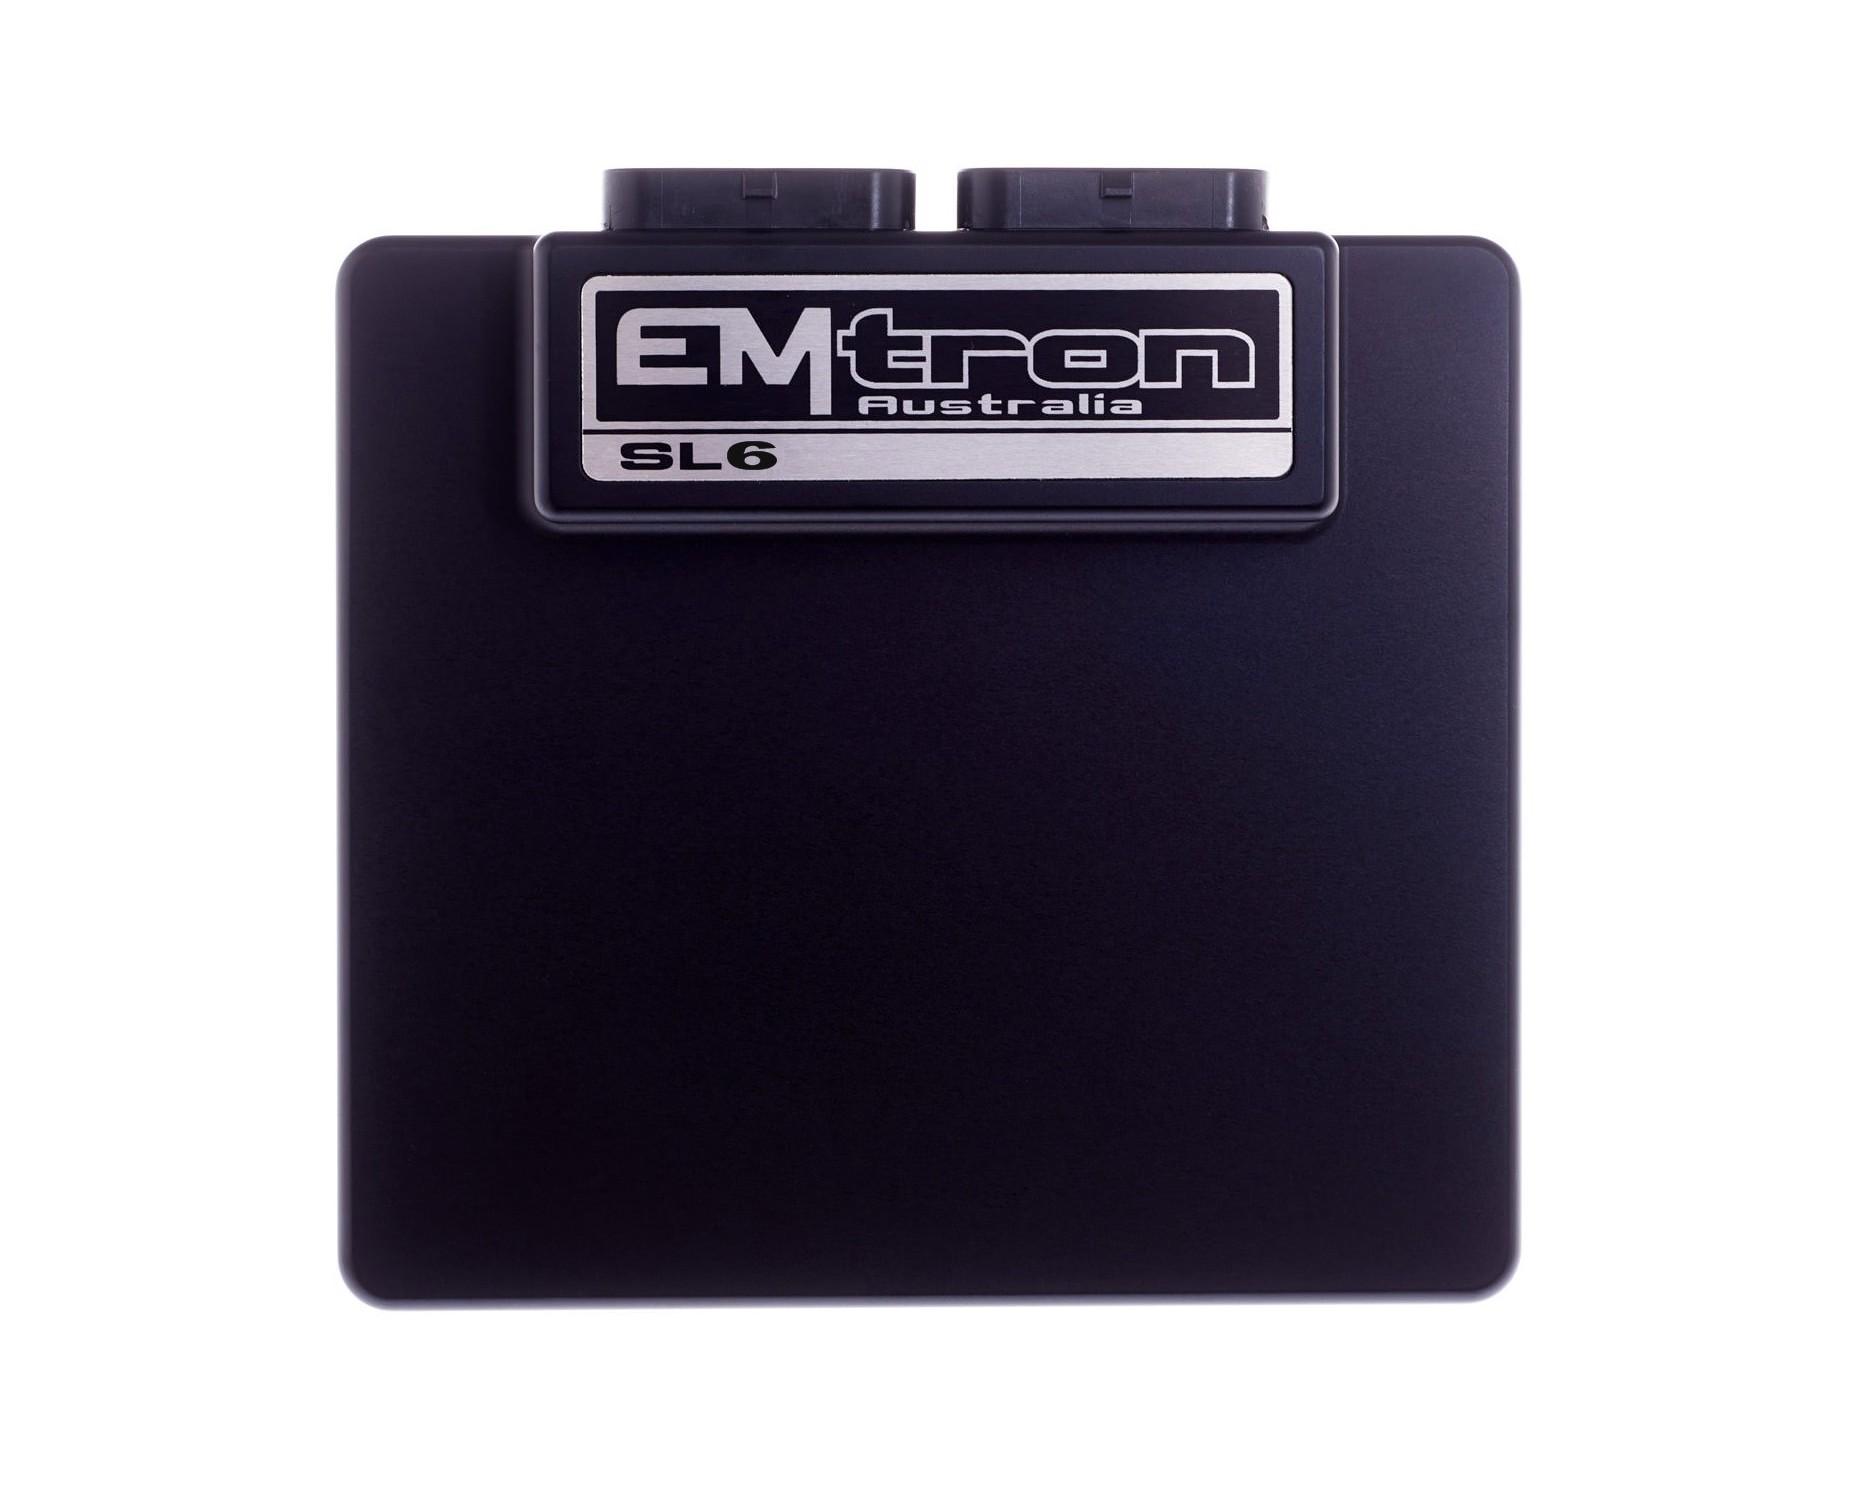 Emtron SL6 ECU